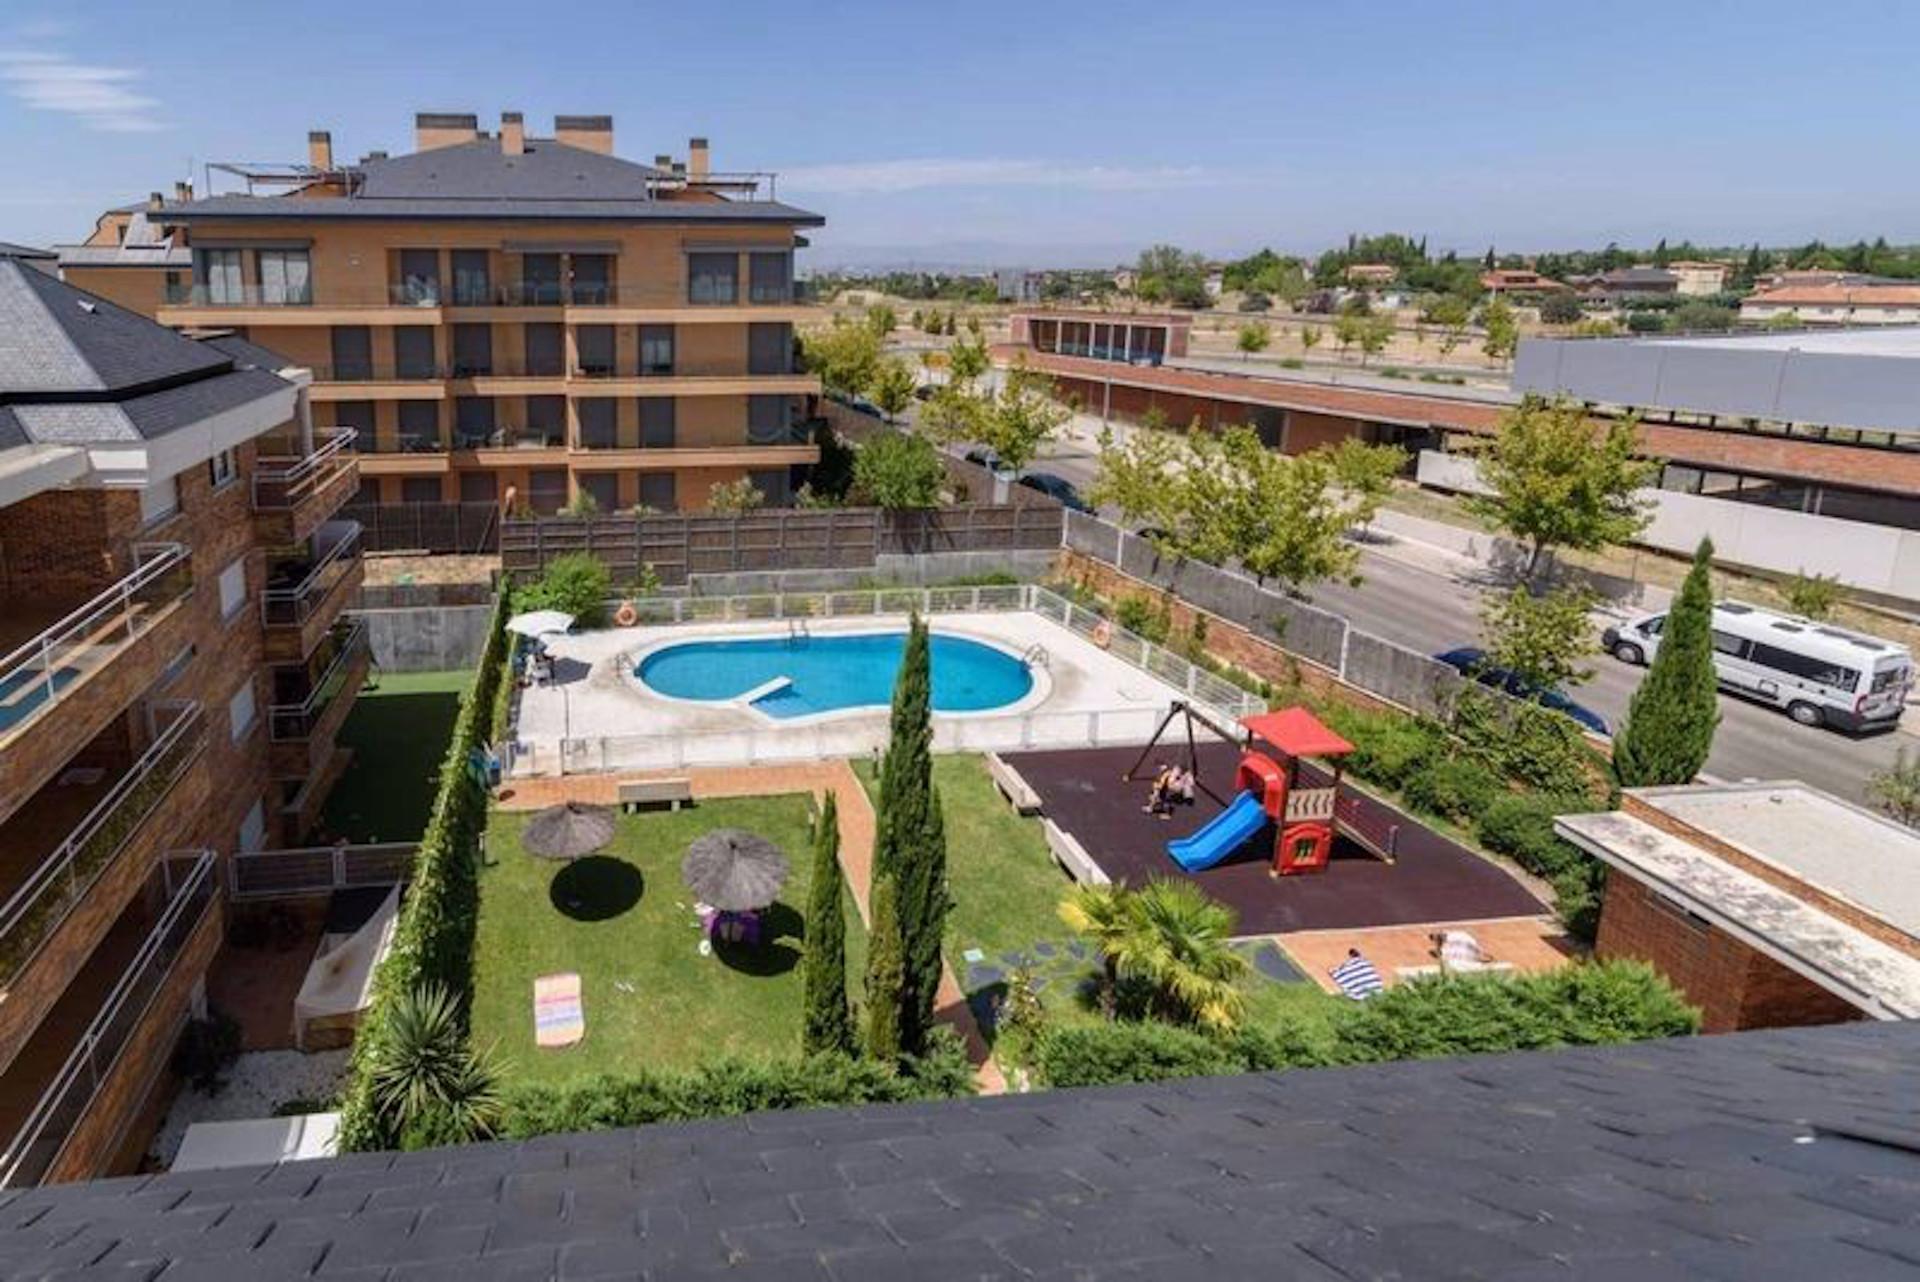 Residencial Mirabal (Boadilla del Monte, Madrid)